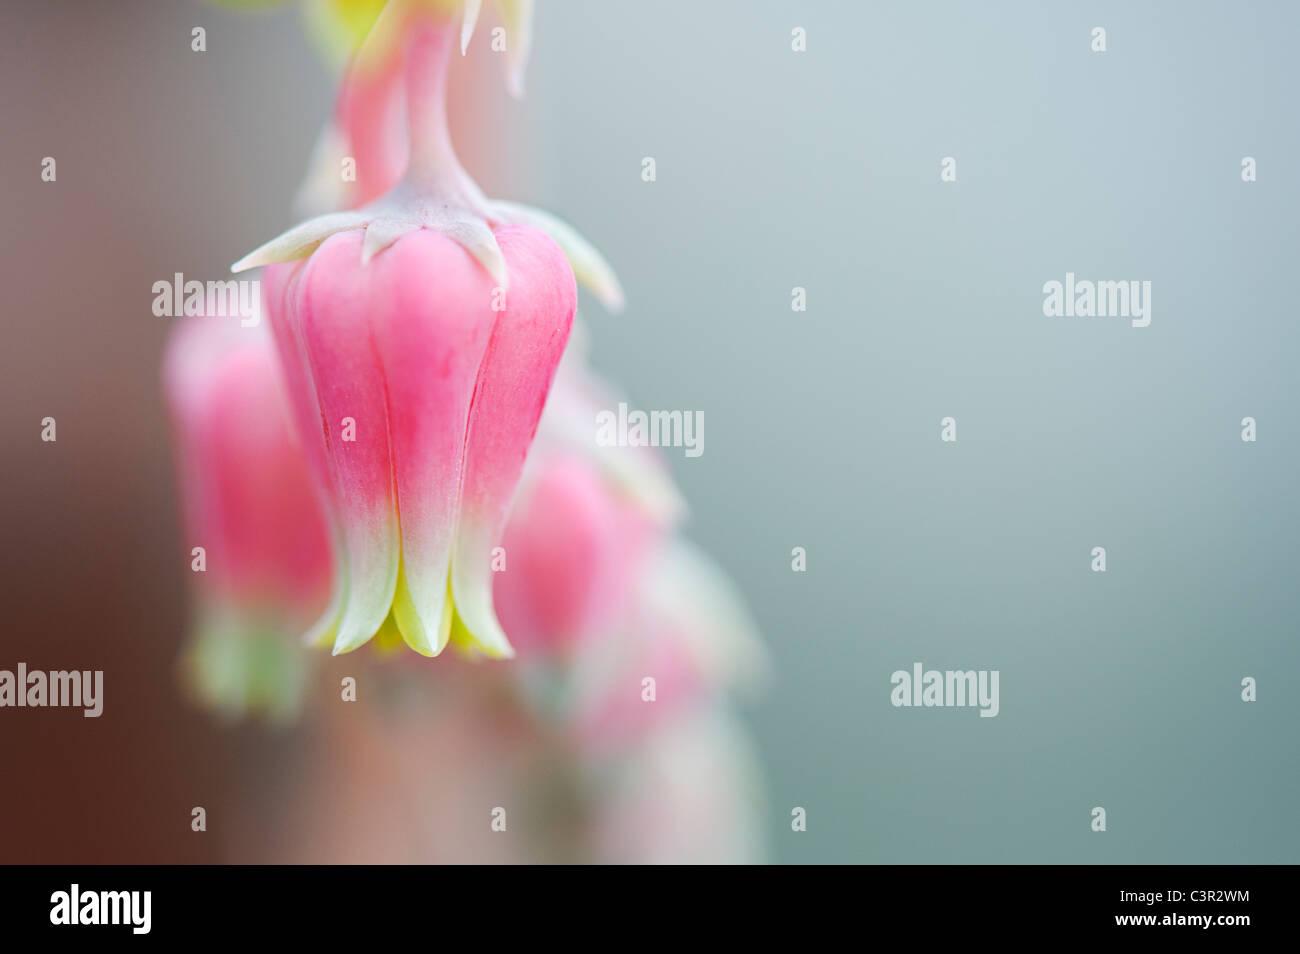 Echeveria sanchez mejoradae flores Imagen De Stock